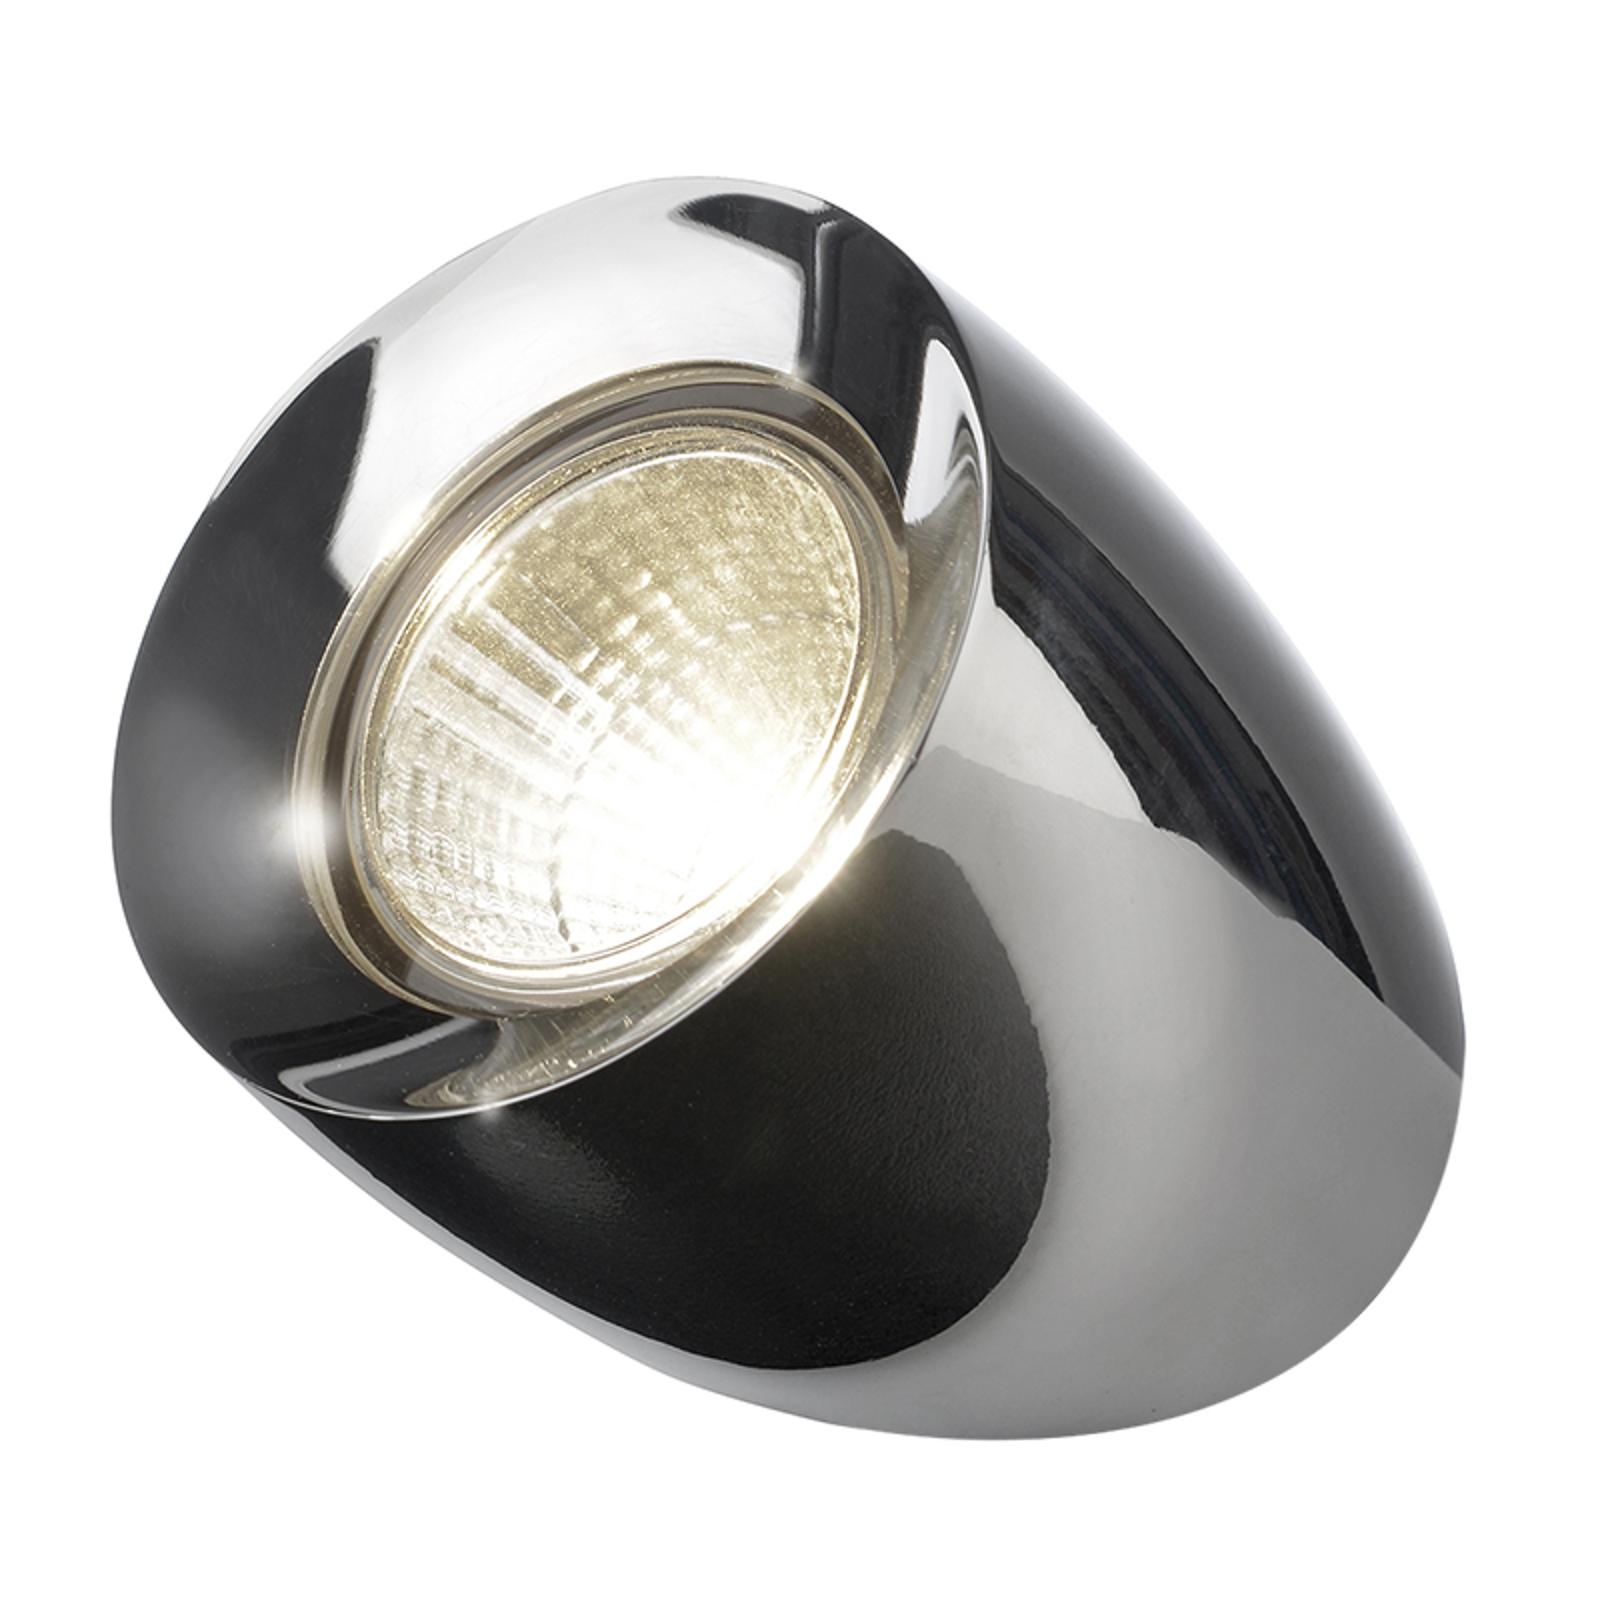 Lampa stołowa LED Ovola, chrom